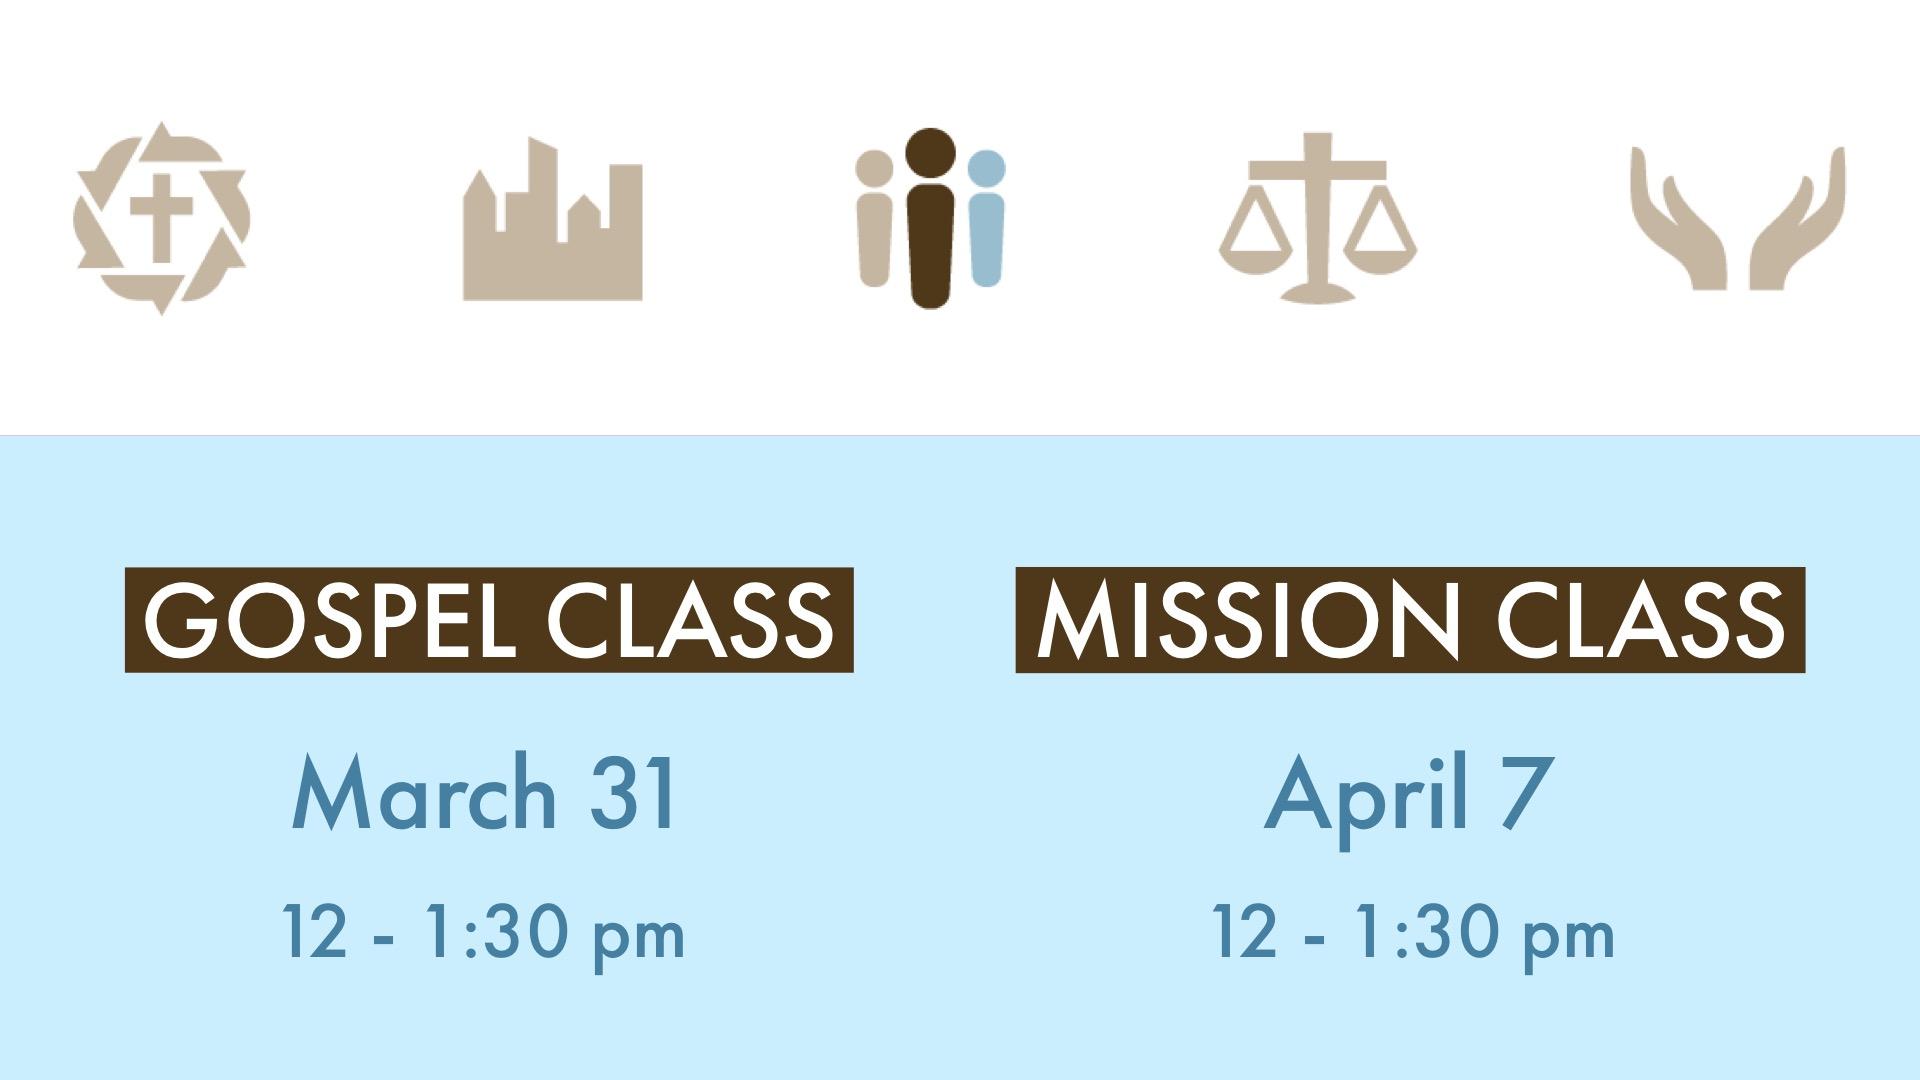 gospel:mission class spring 2019 image